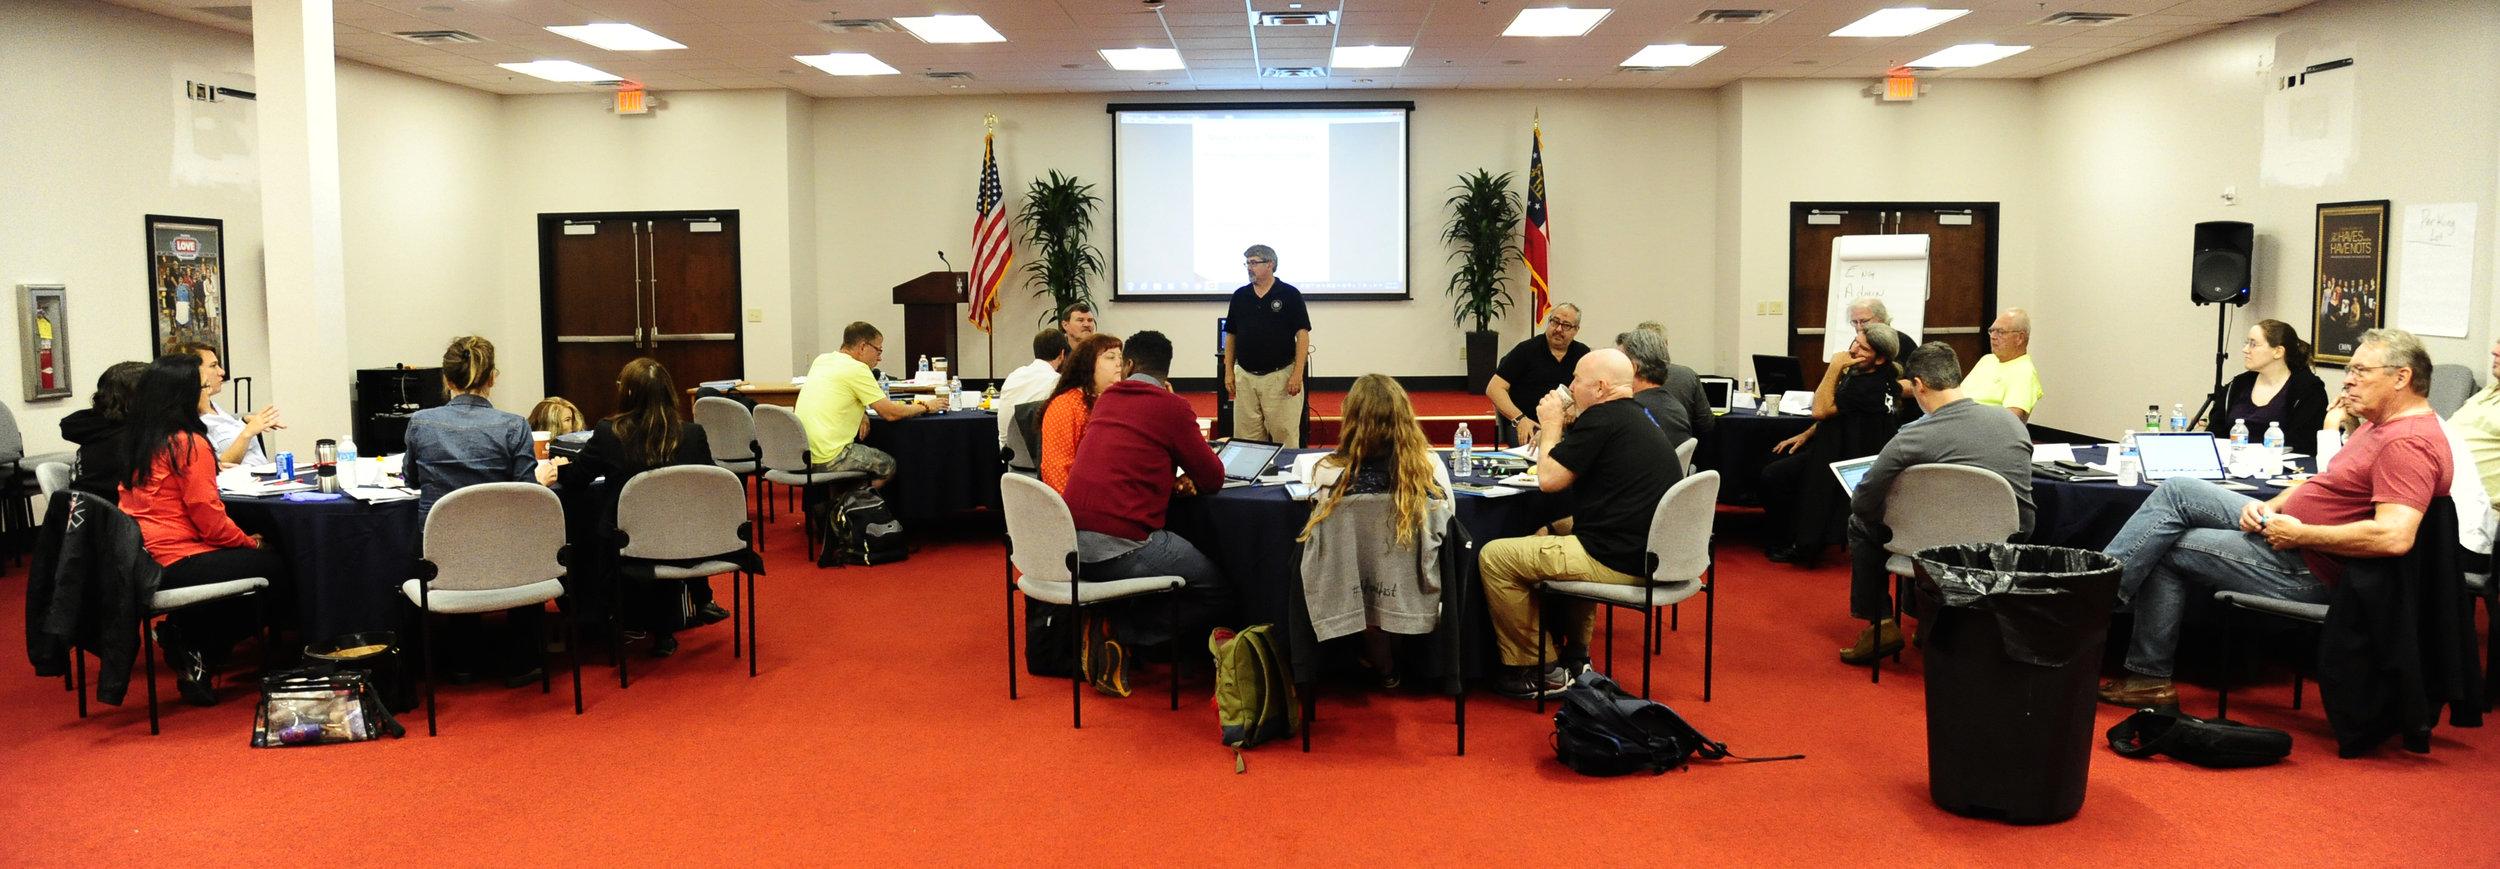 IATSE TTF Train the Trainer in Atlanta, GA | October 10 & 11, 2015